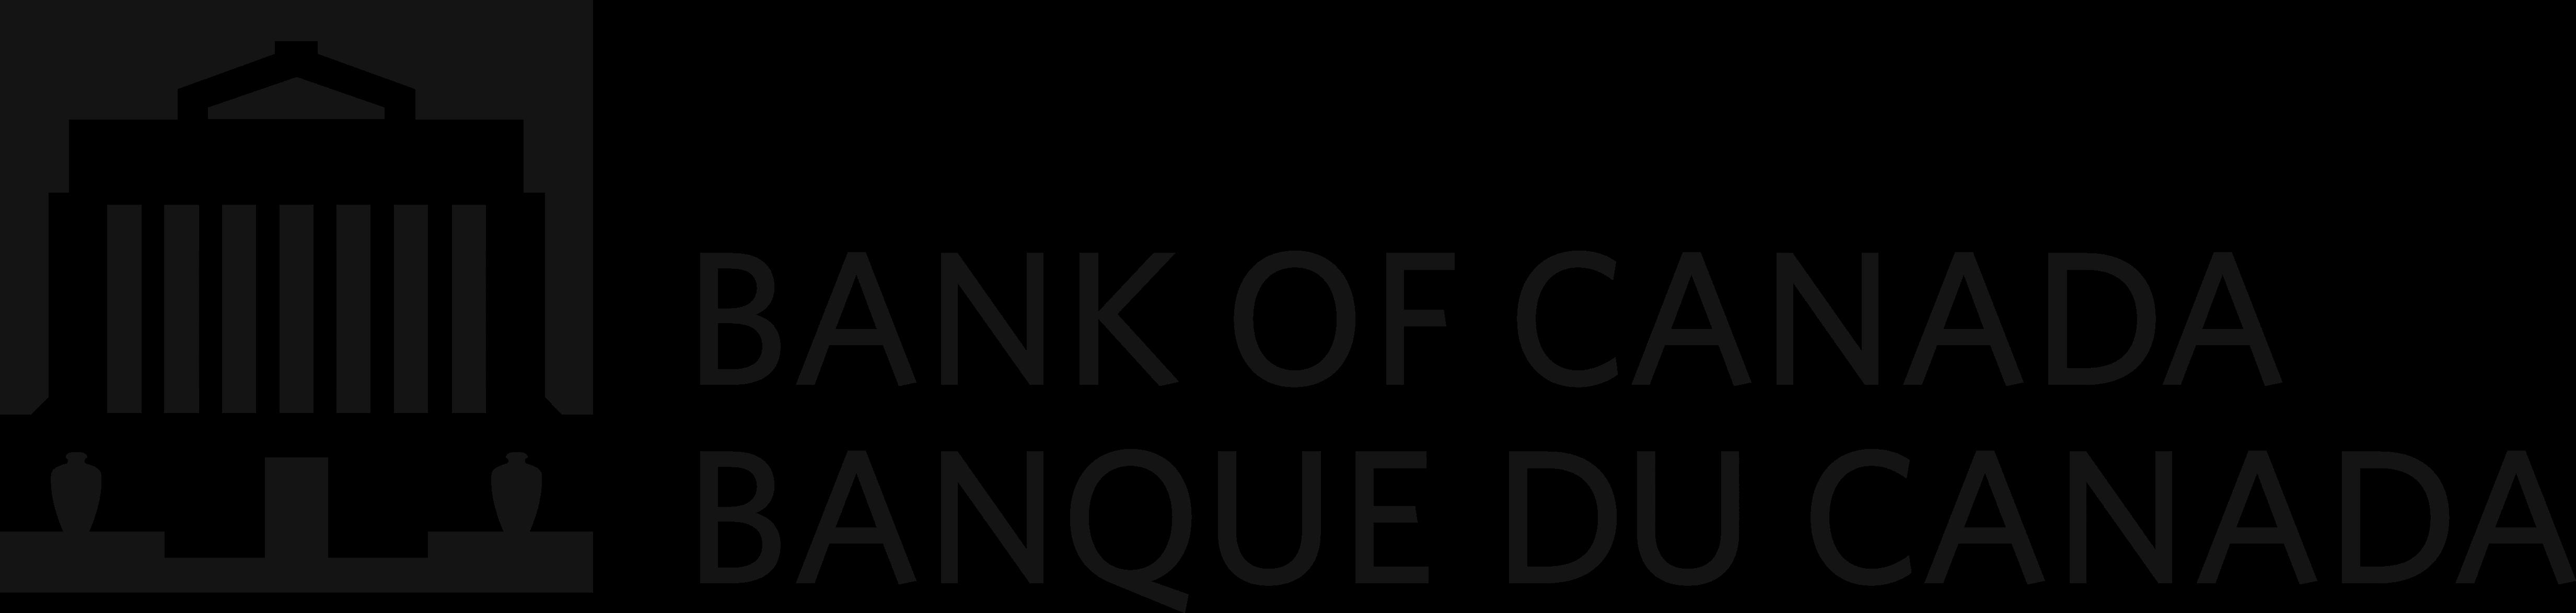 bank of canada logo v3